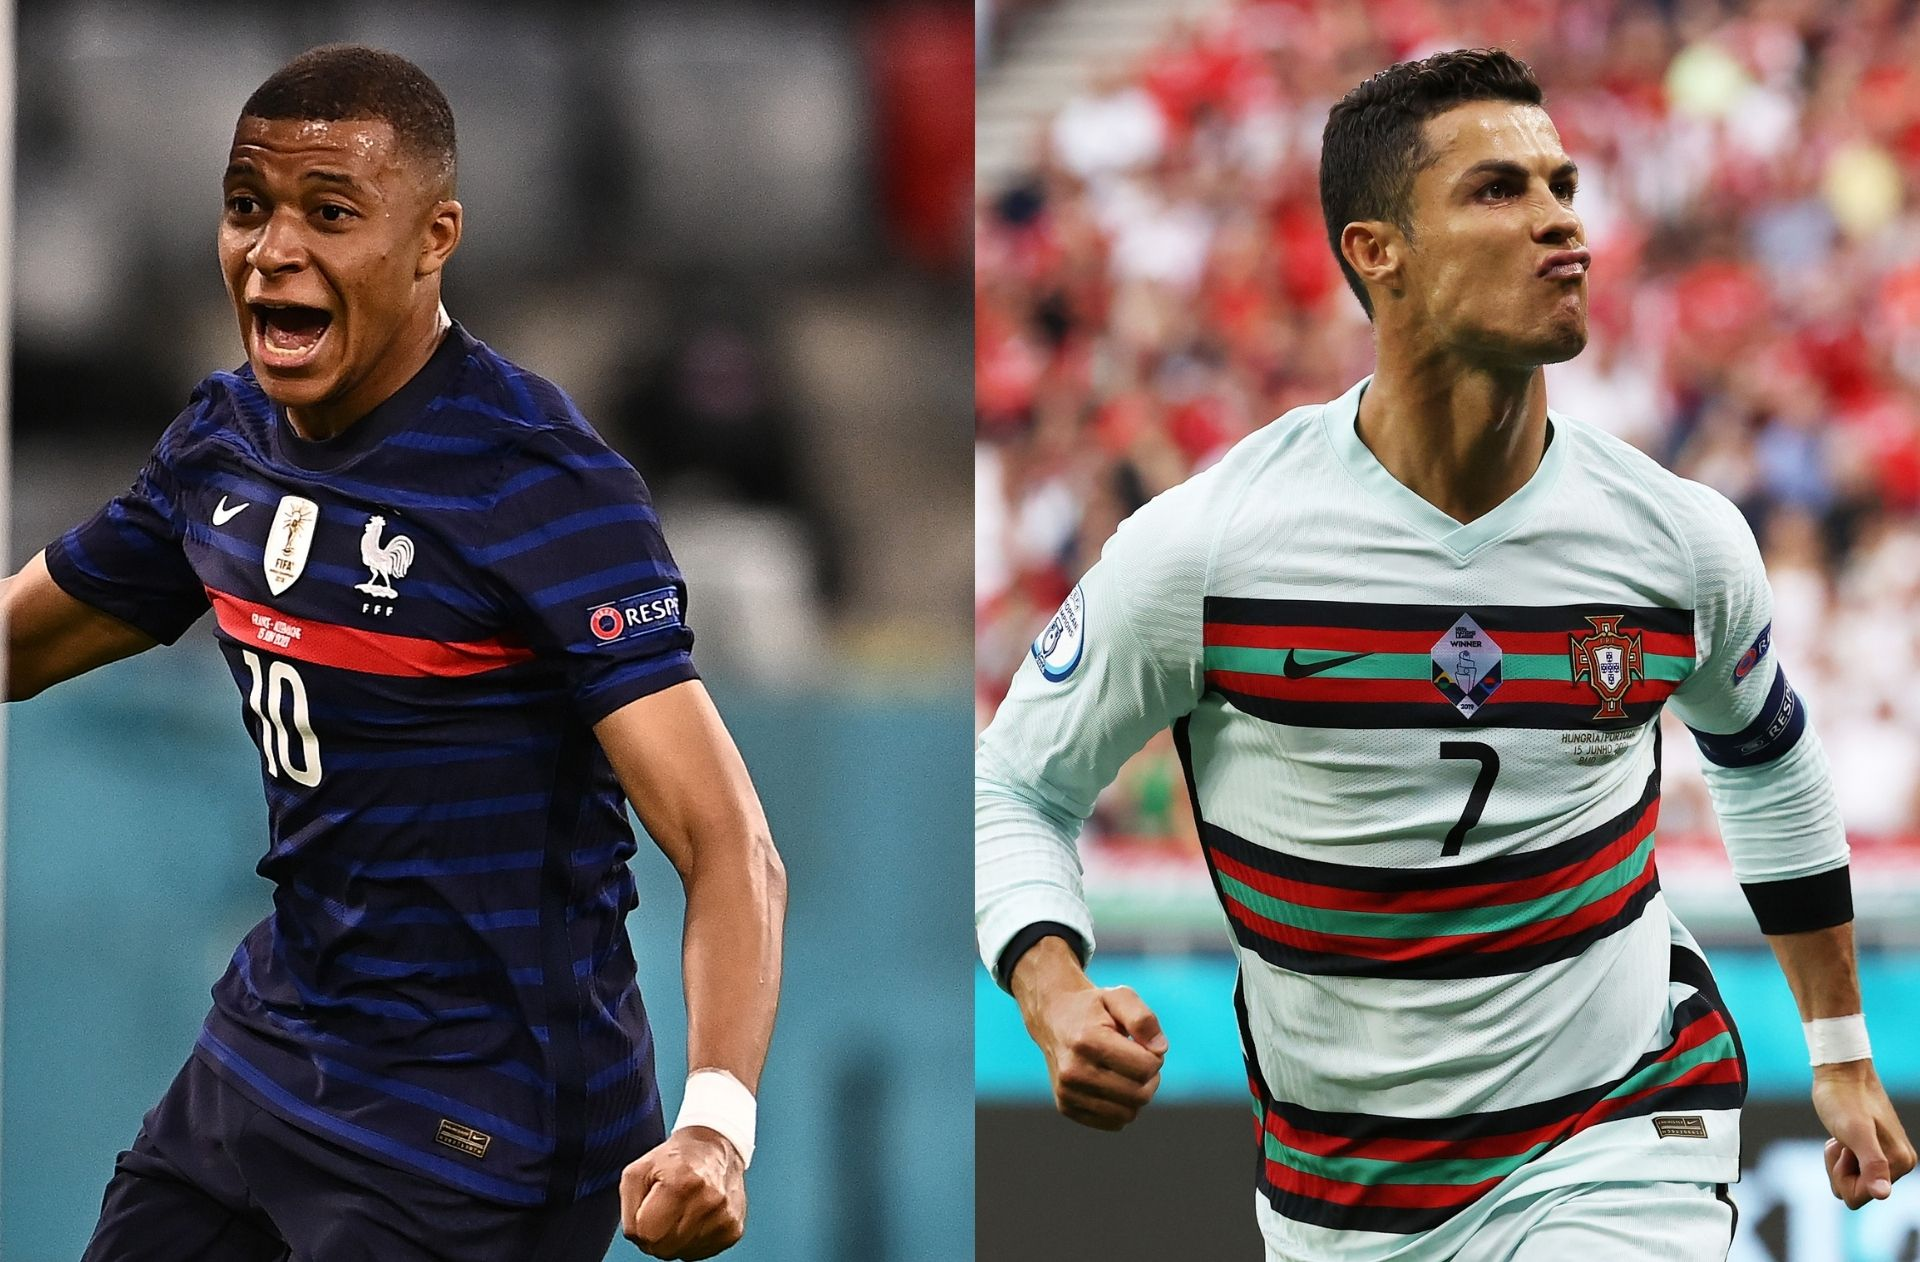 Kylian Mbappe - France, Cristiano Ronaldo - Portugal